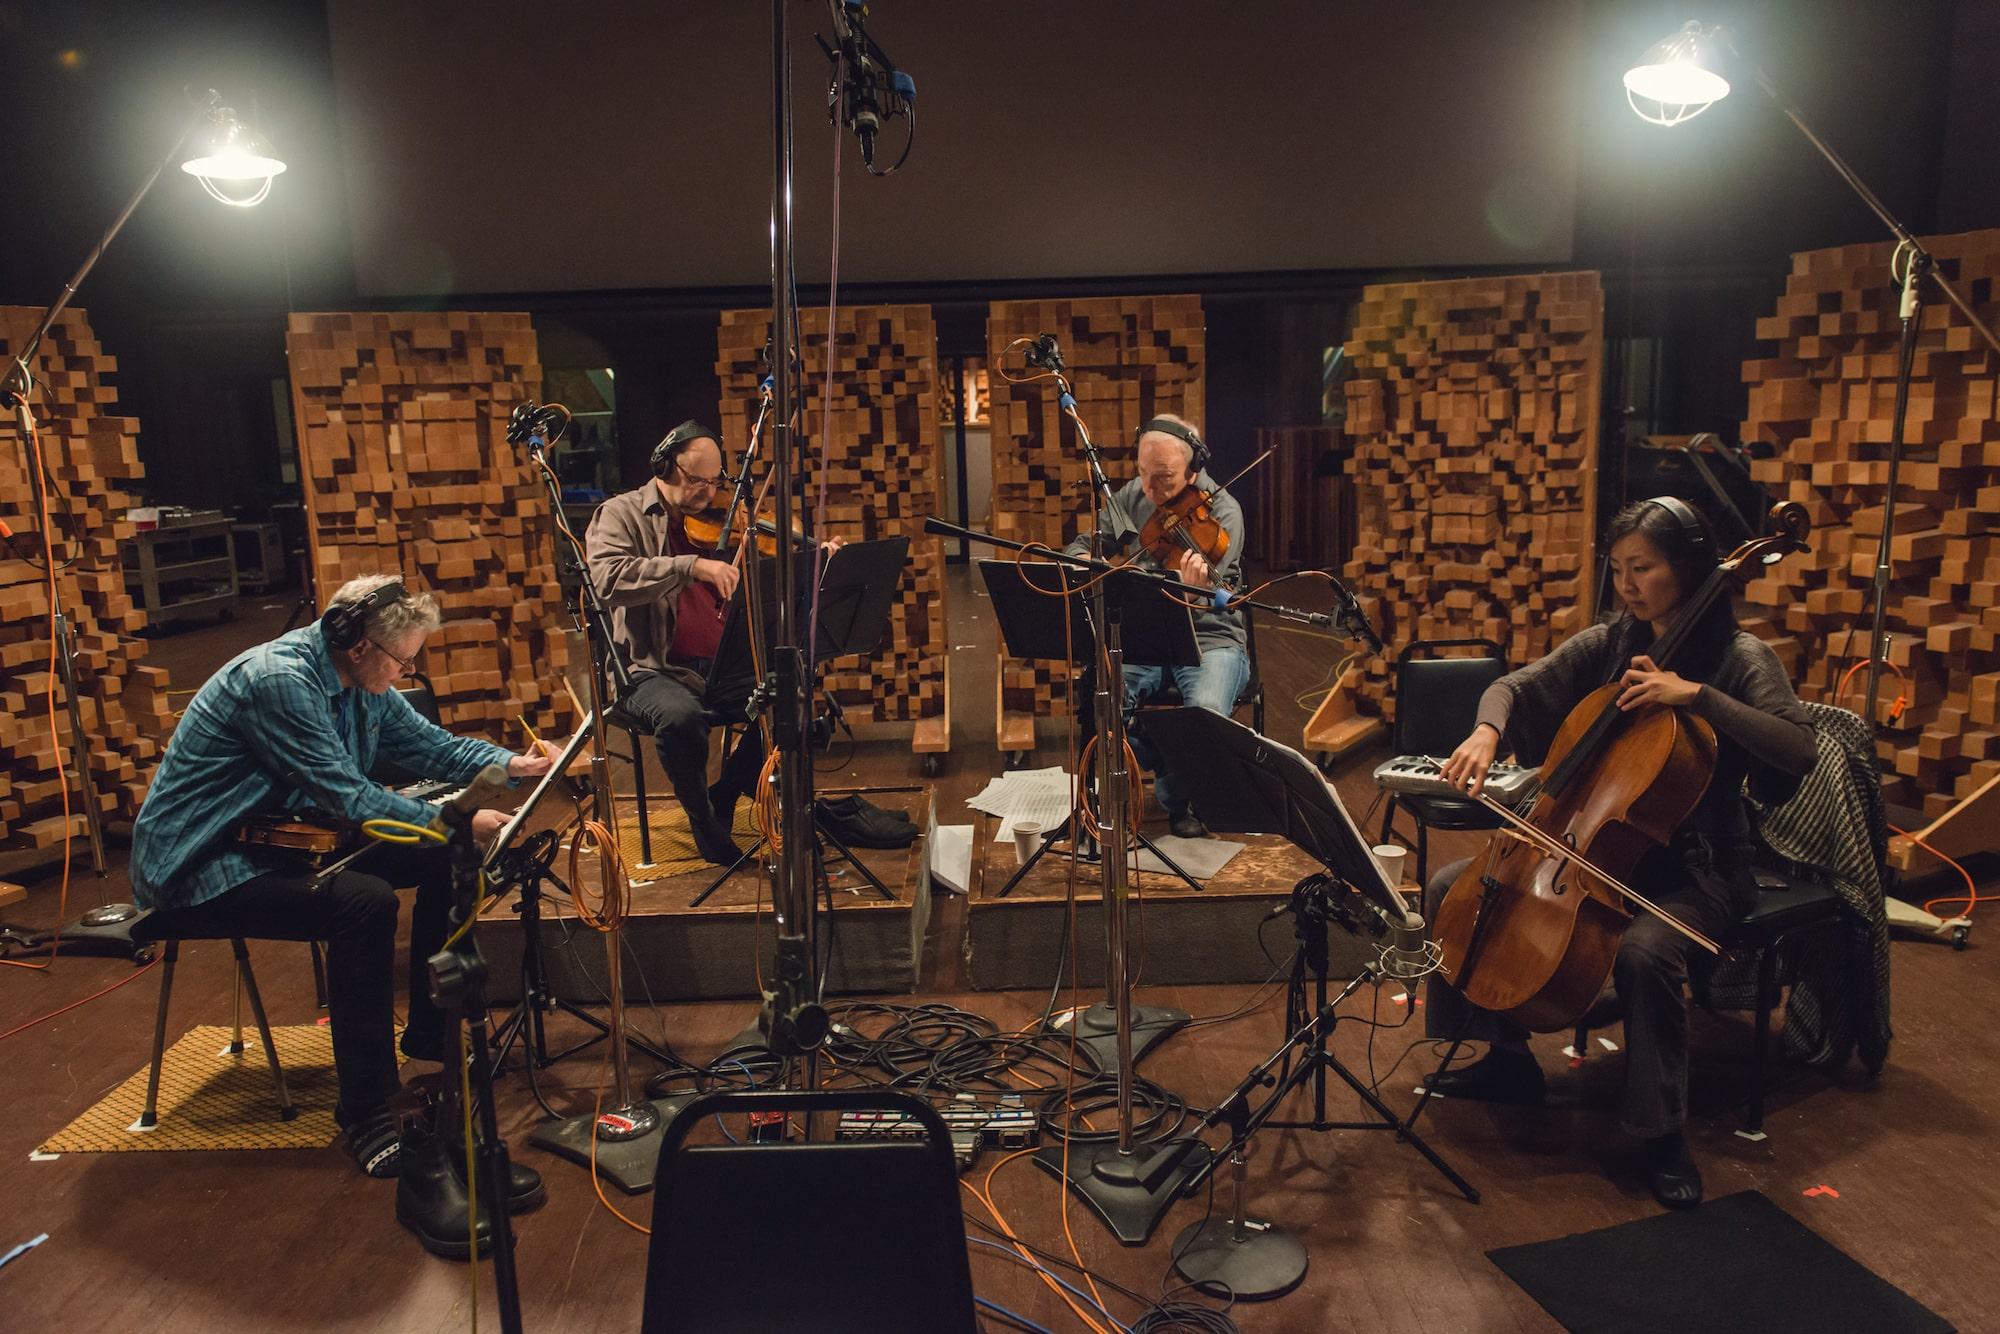 Kronos Quartet recording at Skywalker Sound, credit Lenny Gonzalez